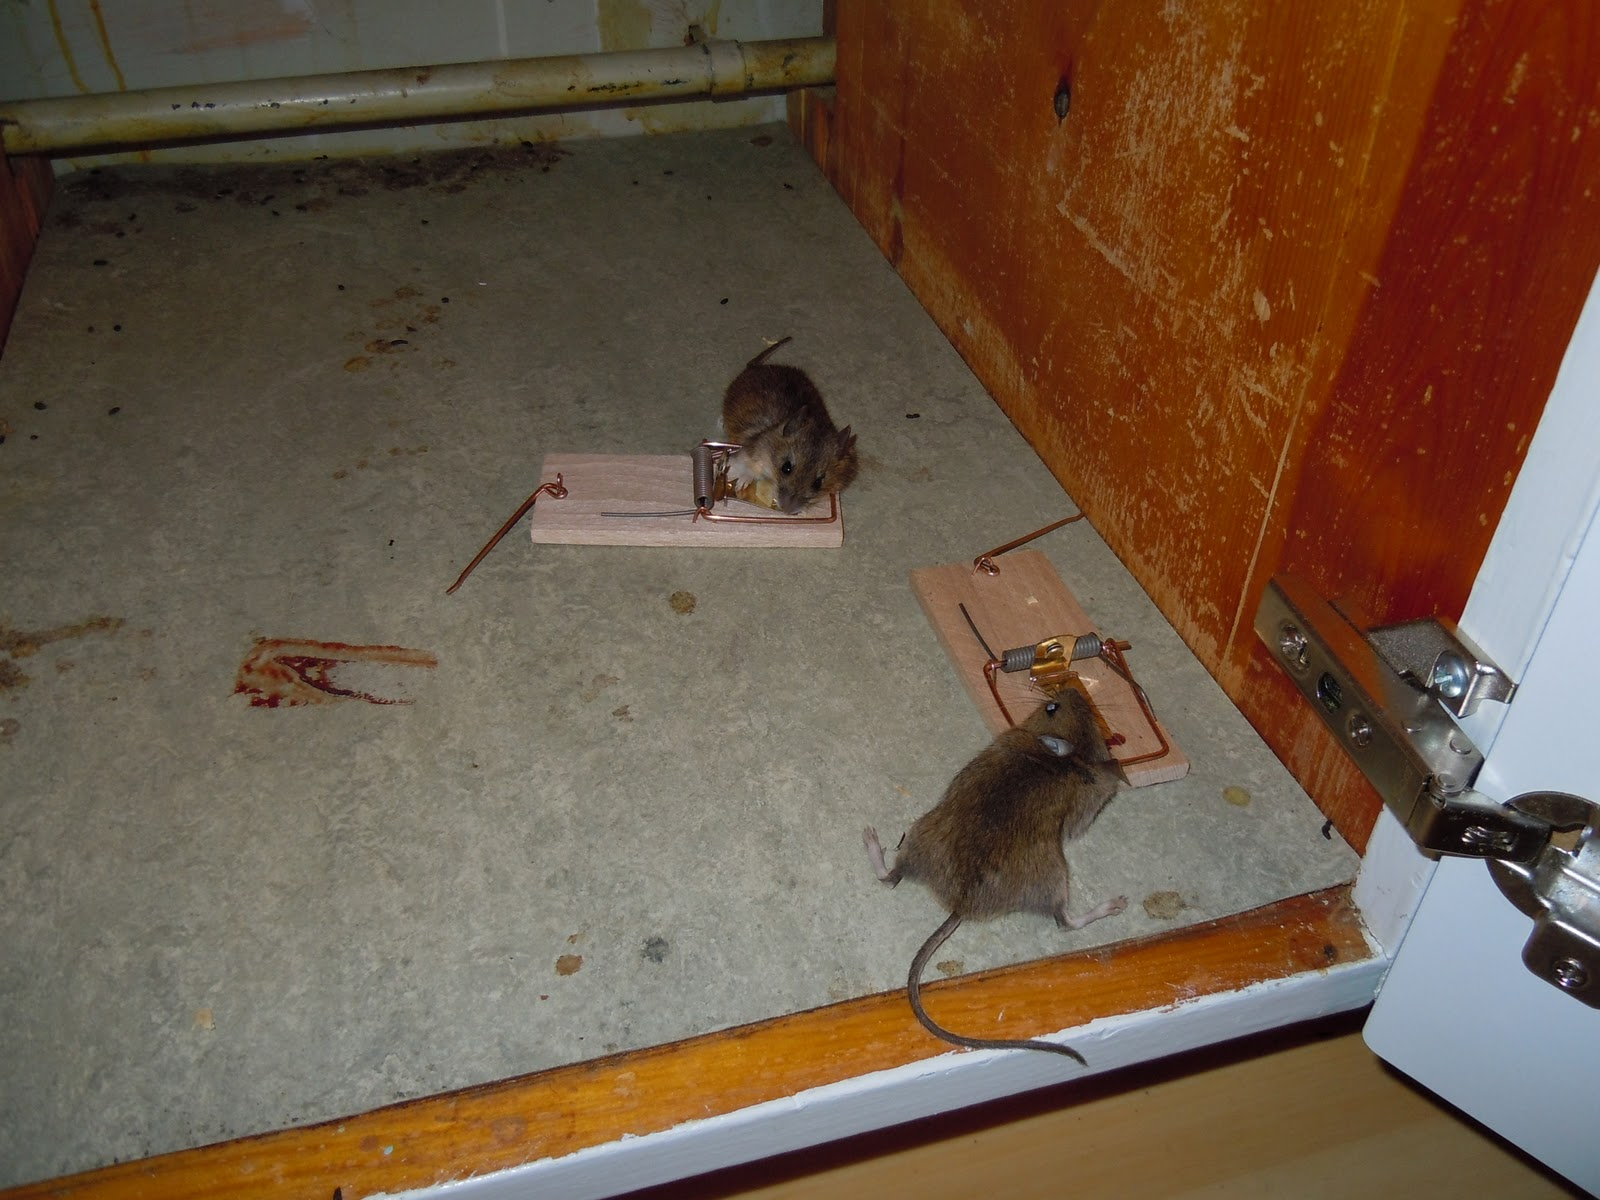 råttfälla clas ohlson